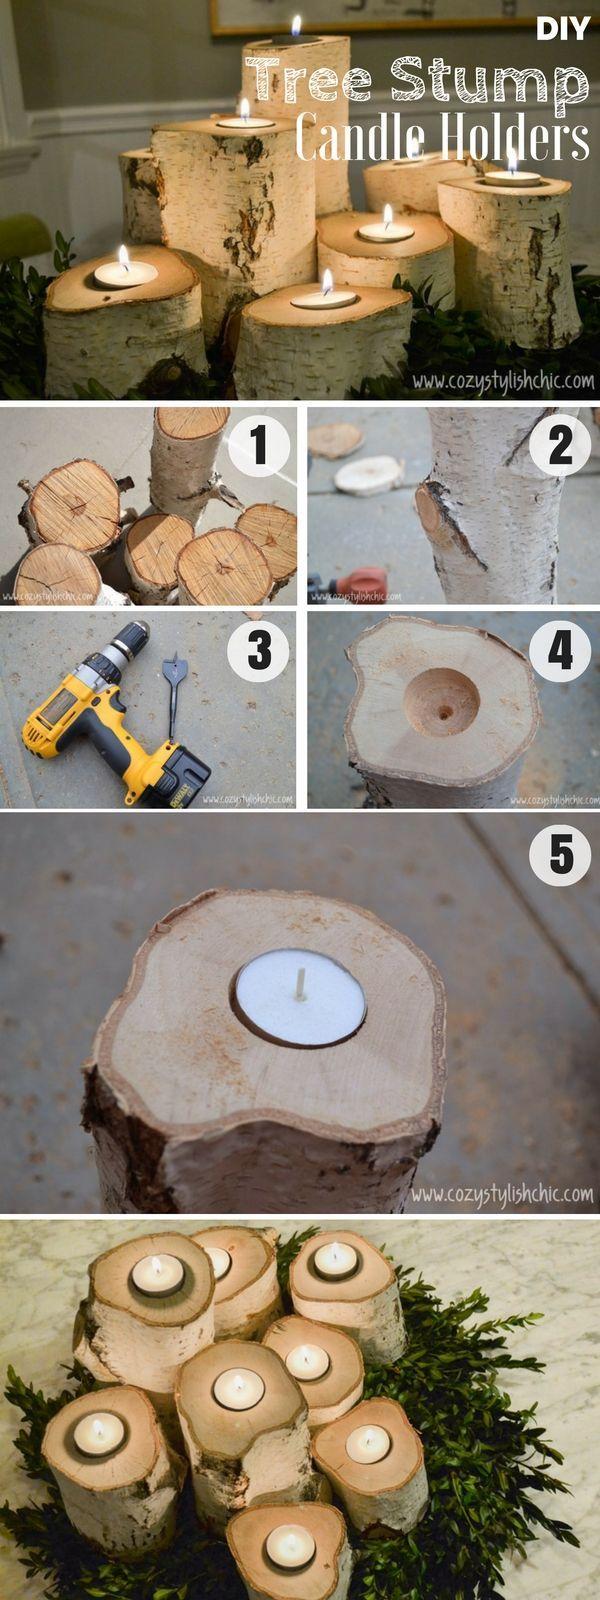 diy log tea light candle holder tea light candles wood grain